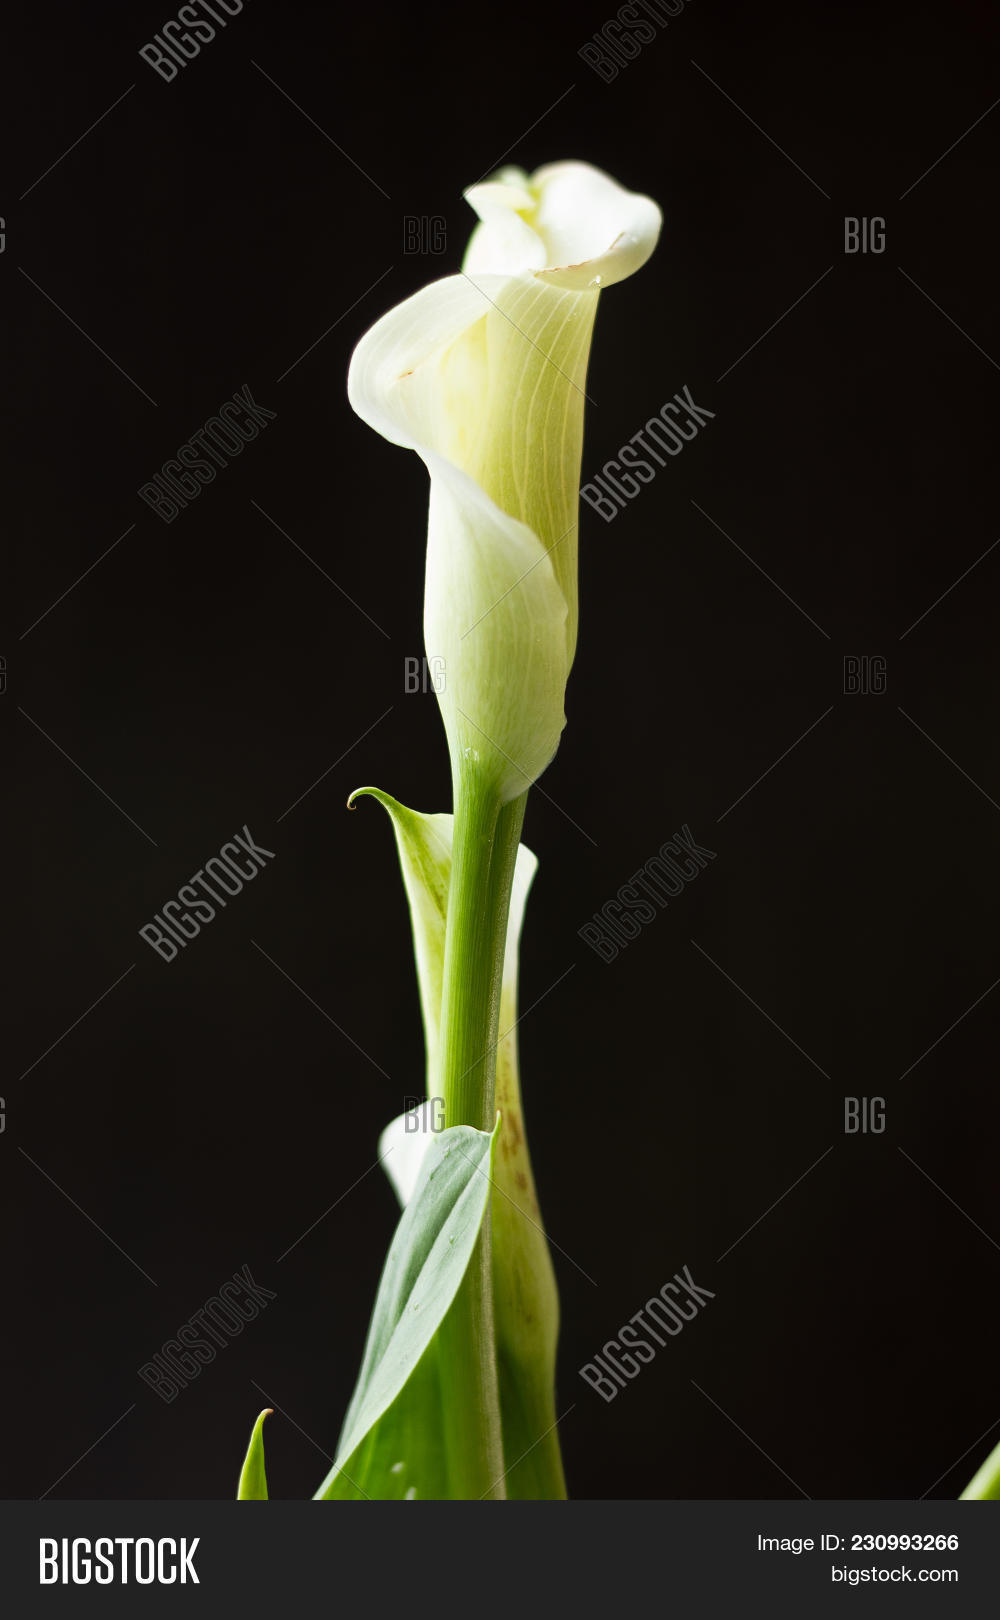 White calla lily image photo free trial bigstock white calla lily flower on a black background izmirmasajfo